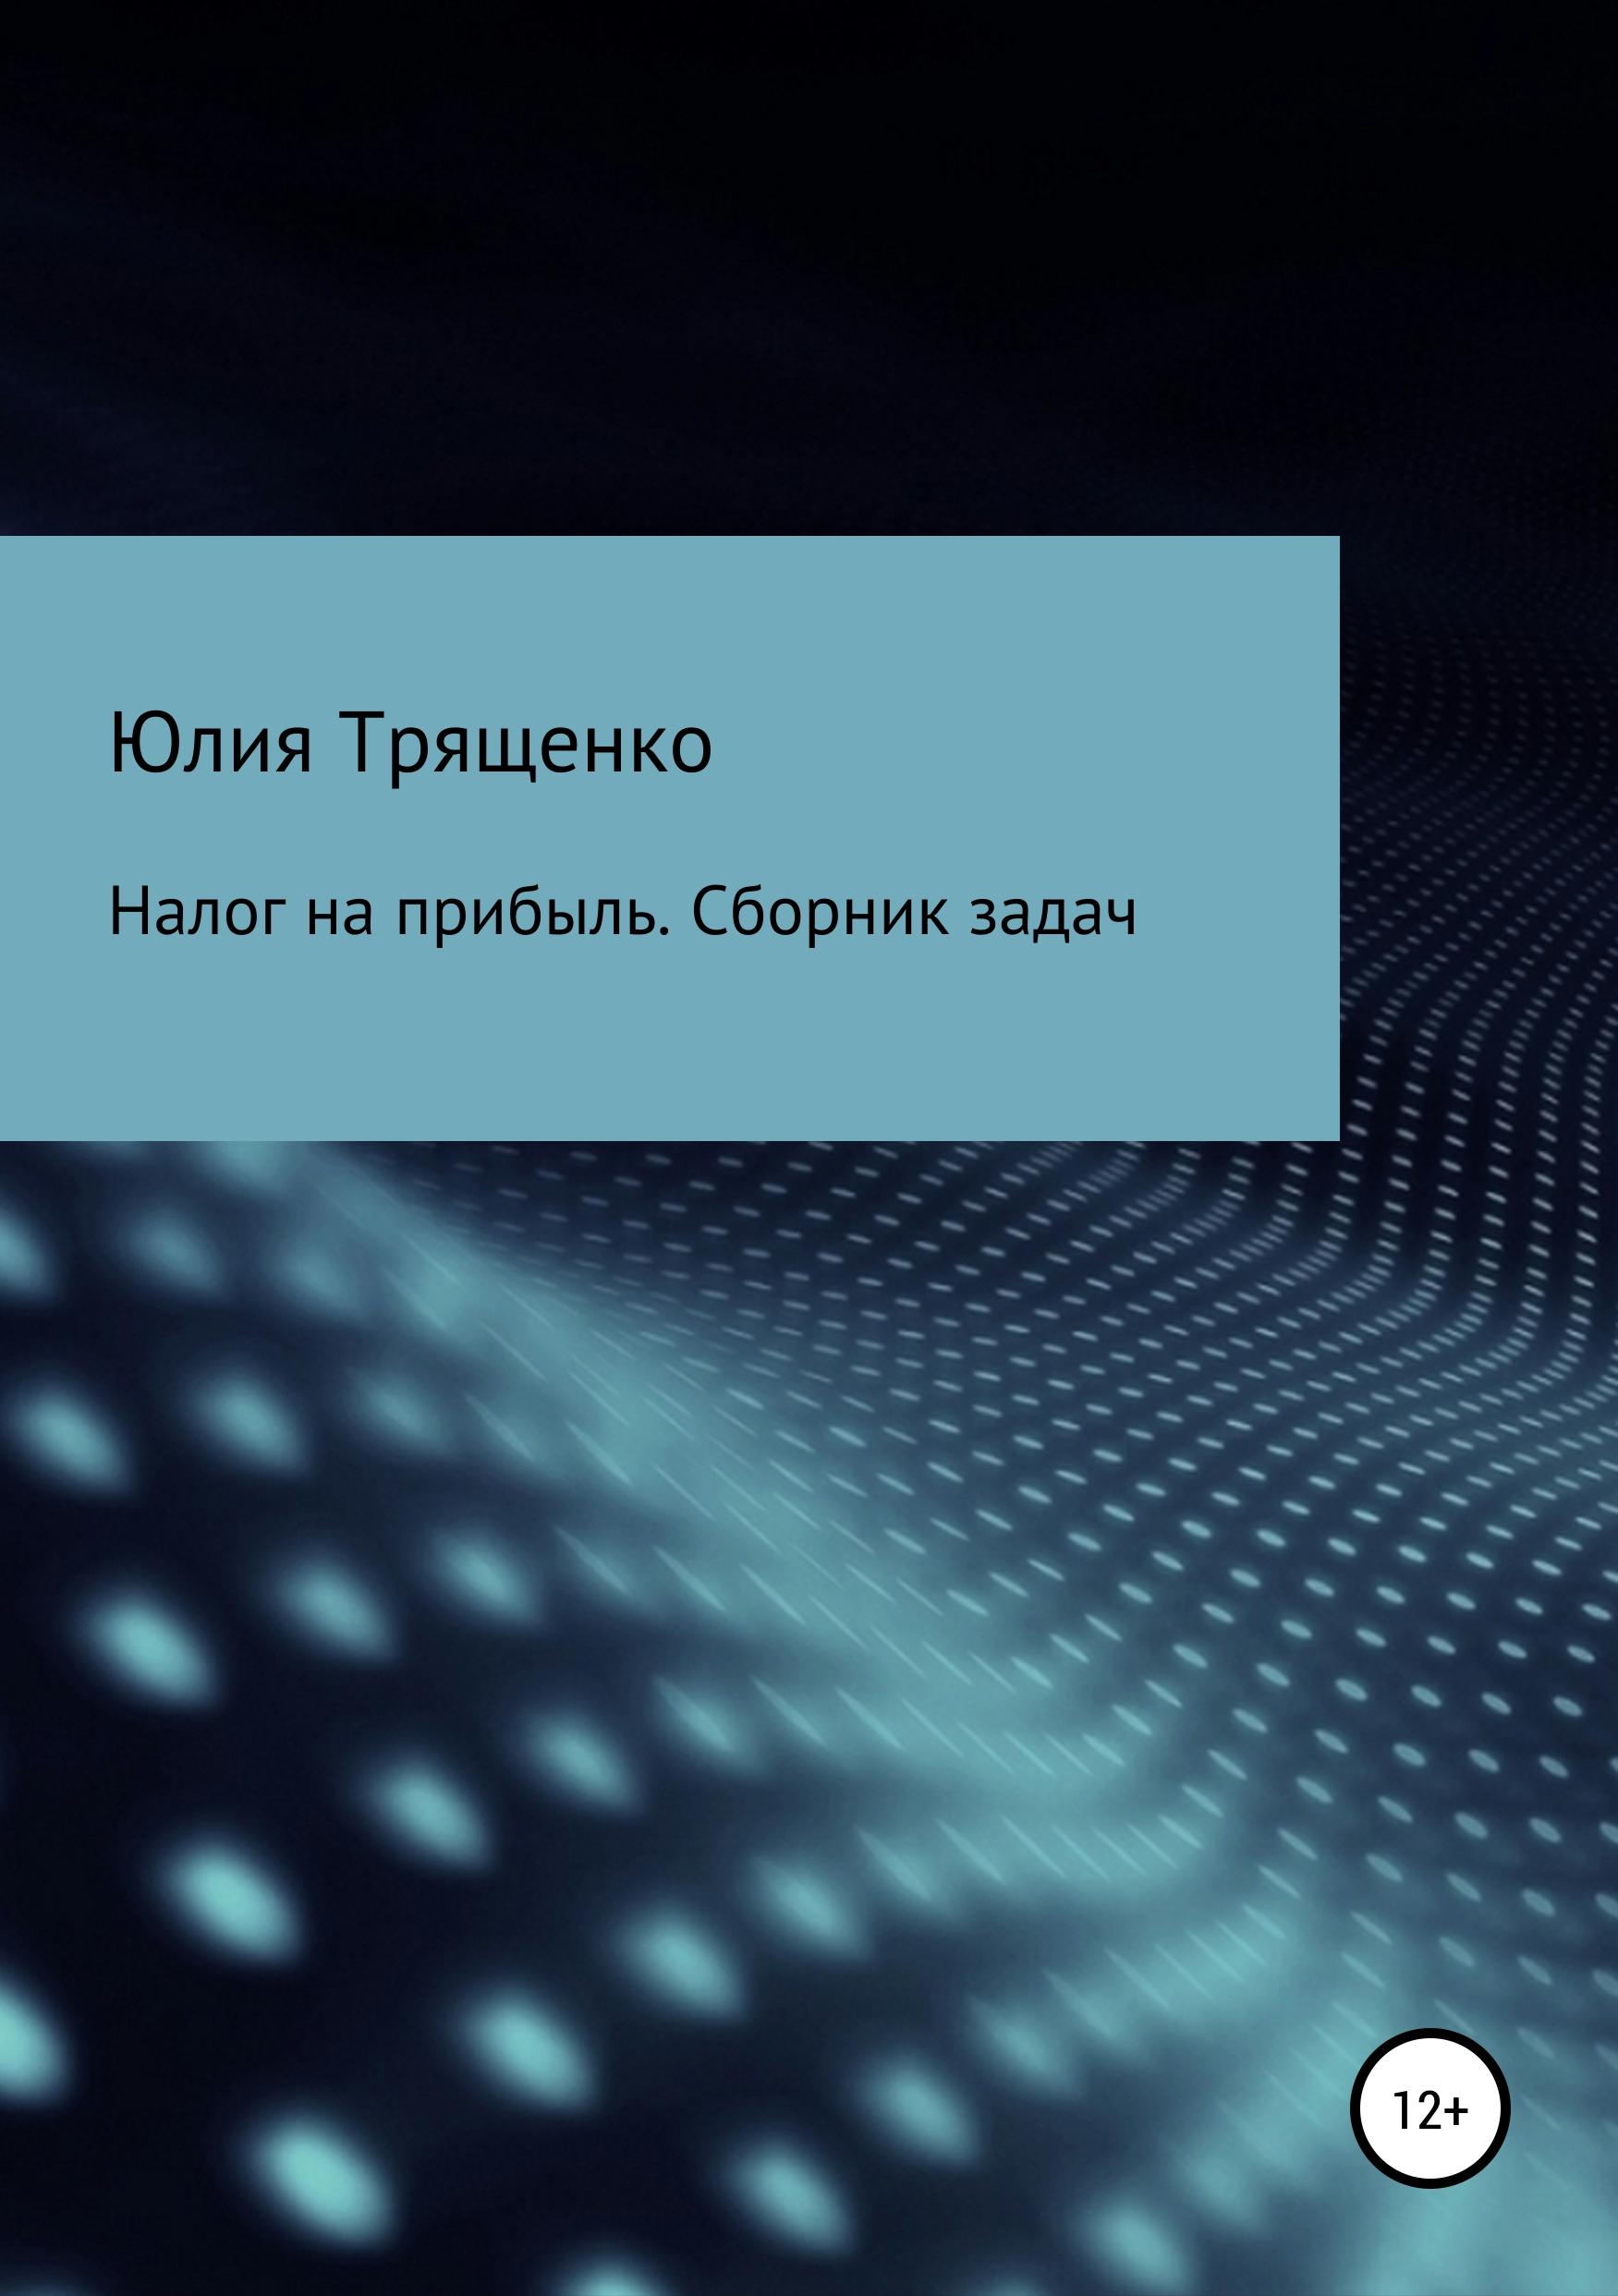 Обложка книги. Автор - Юлия Трященко